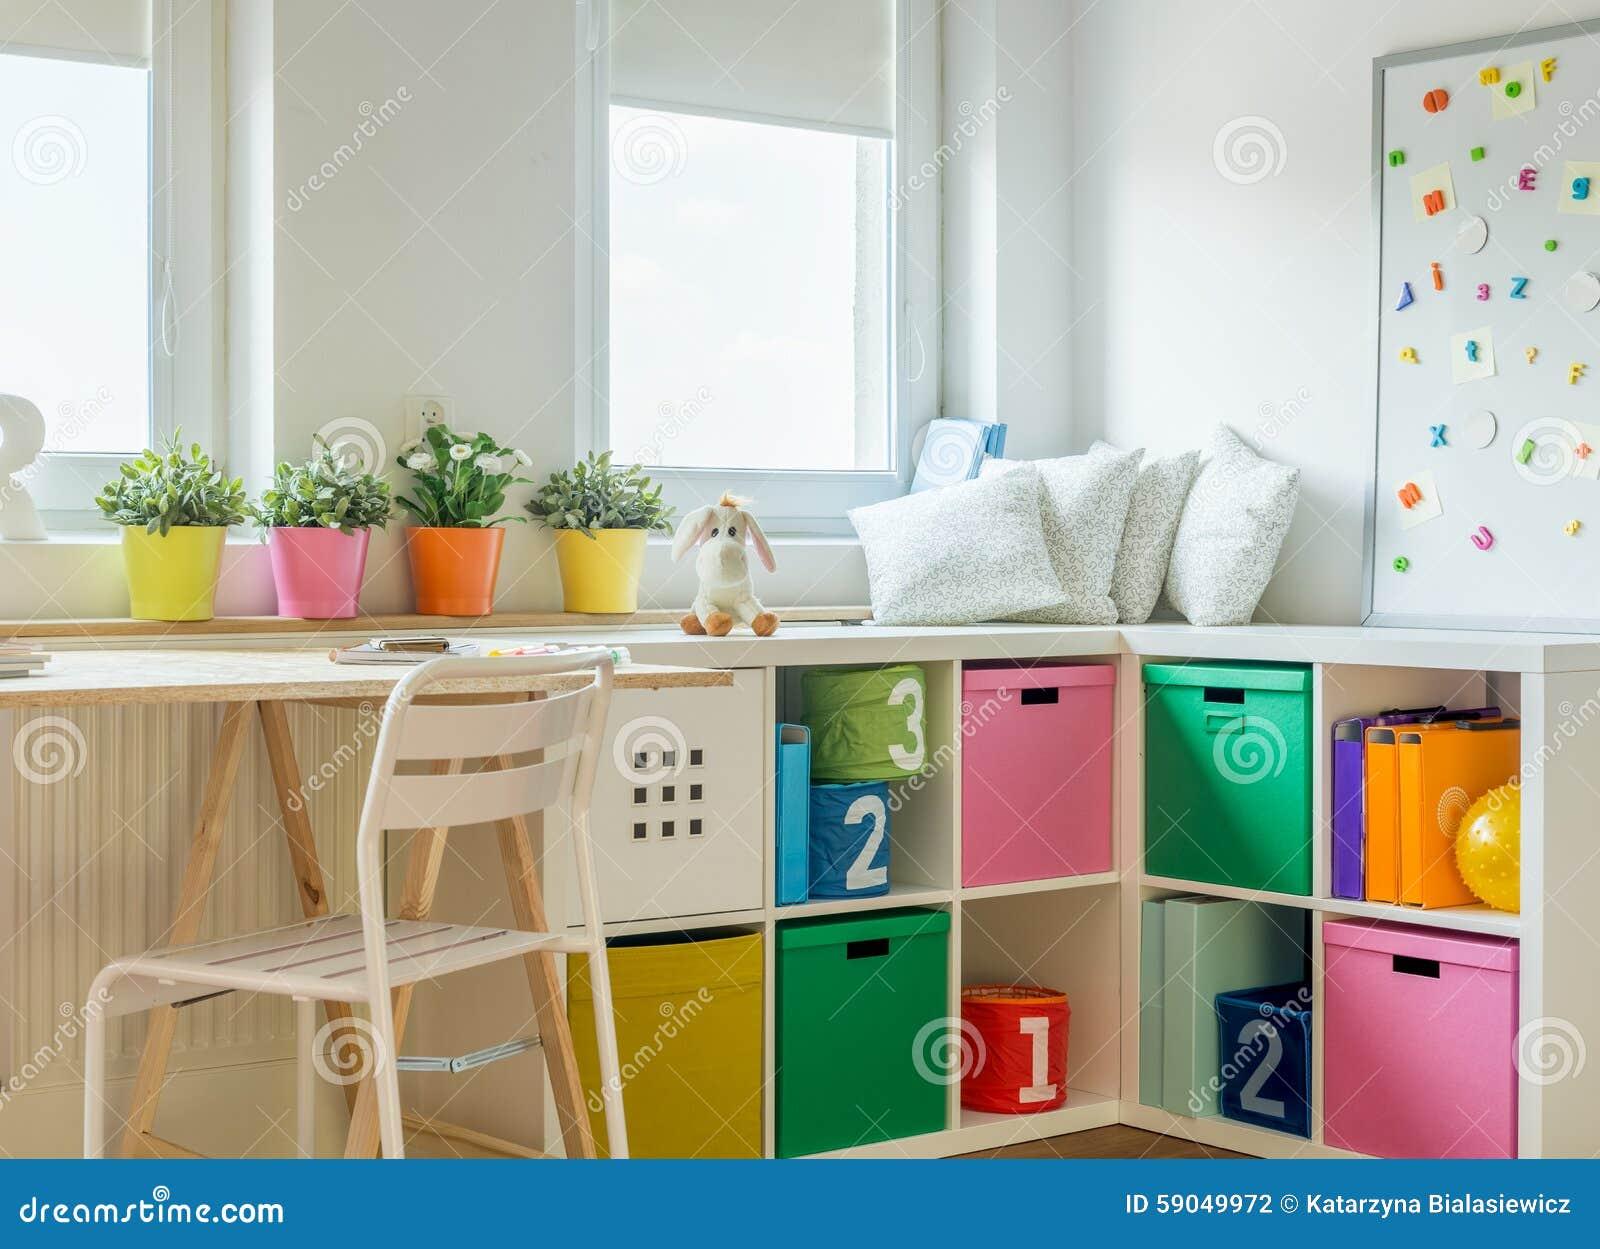 Kid Room Design unisex kids room design stock photo - image: 59049972